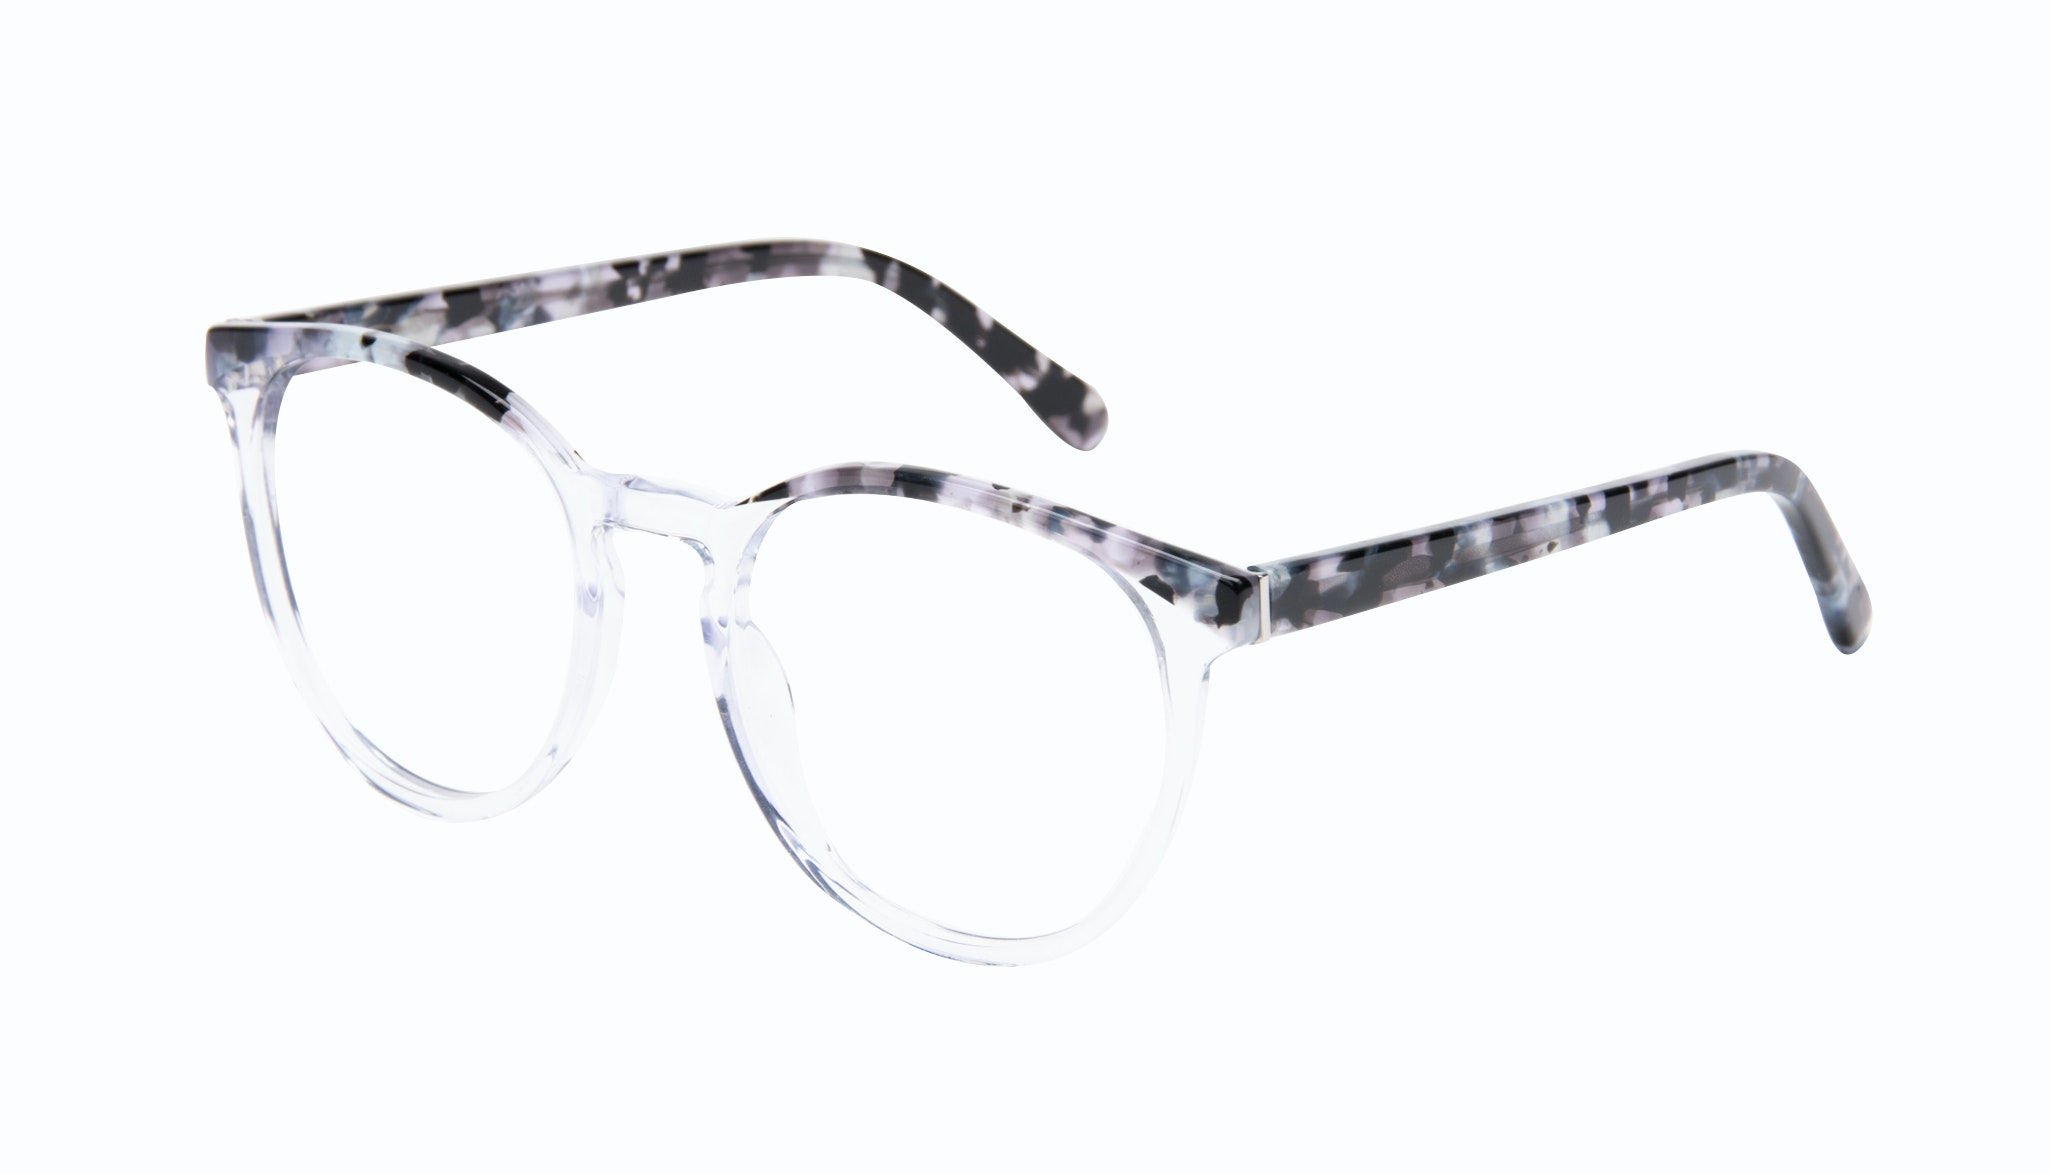 Affordable Fashion Glasses Round Eyeglasses Women Brilliant Cloud Tilt